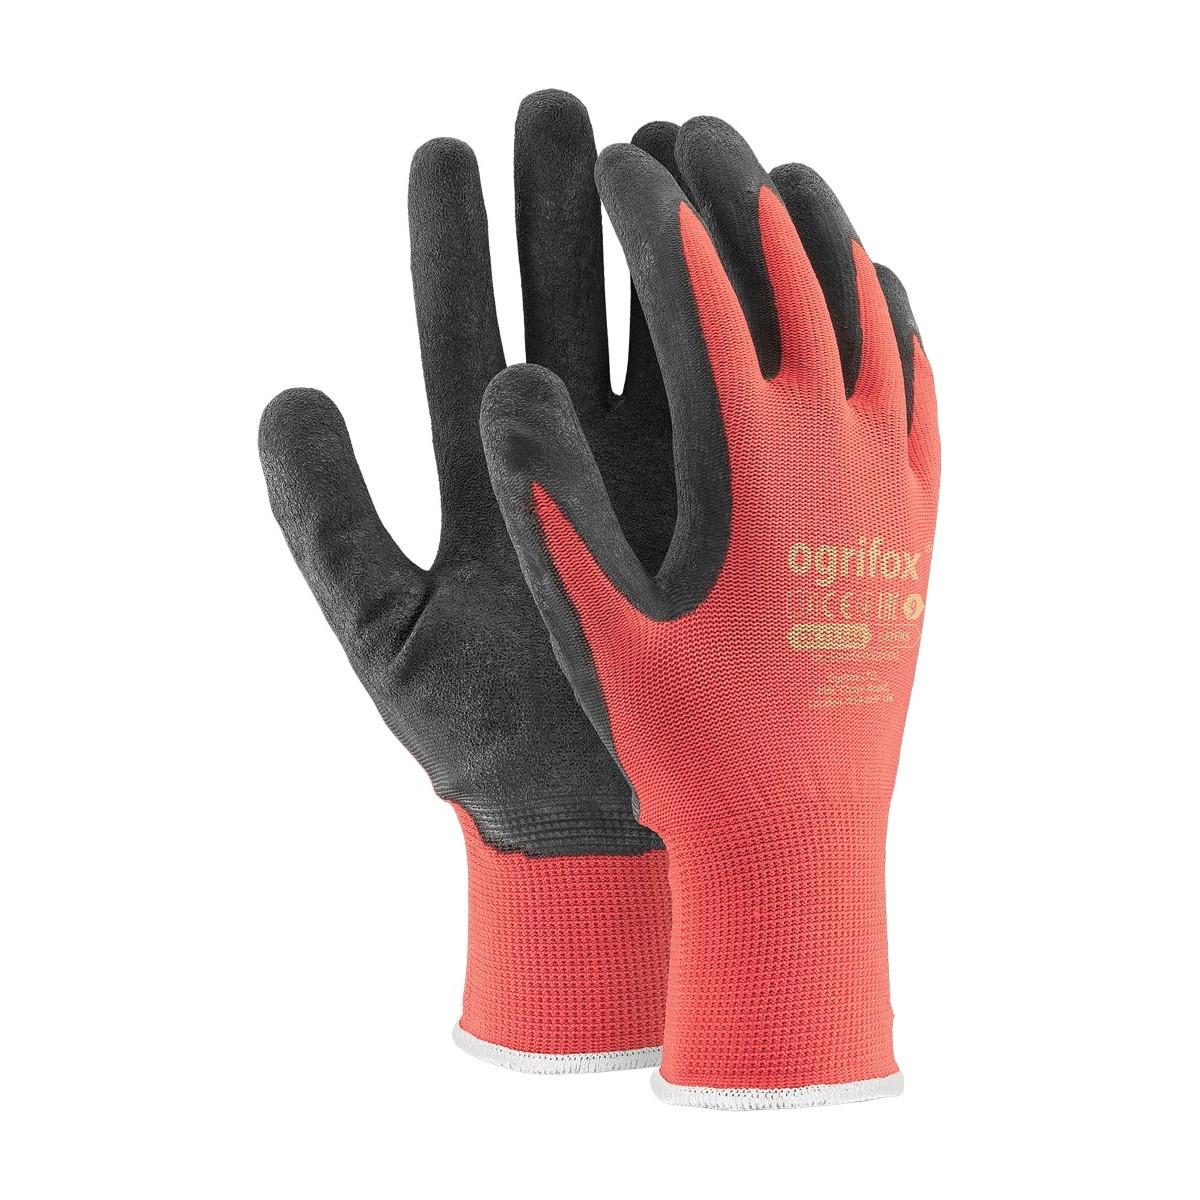 Rękawice ochronne OX-LATEKS CB powlekane lateksem